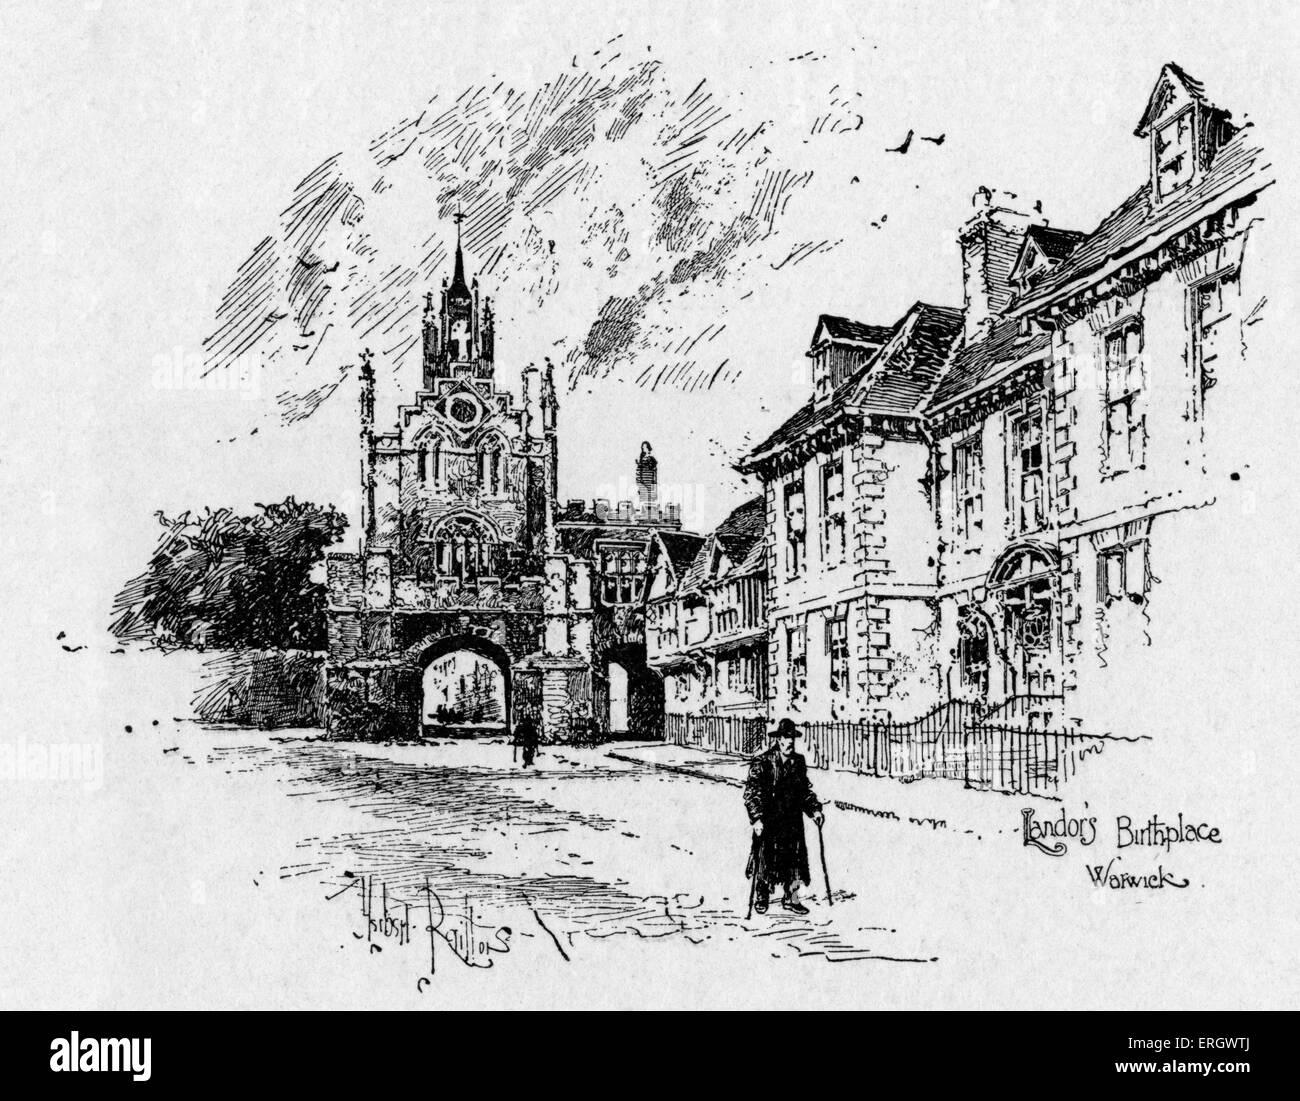 Walter Savage Landor's birthplace at Warwick. WSL: English writer and poet, 30 January 1775 – 17 September 1864. - Stock Image